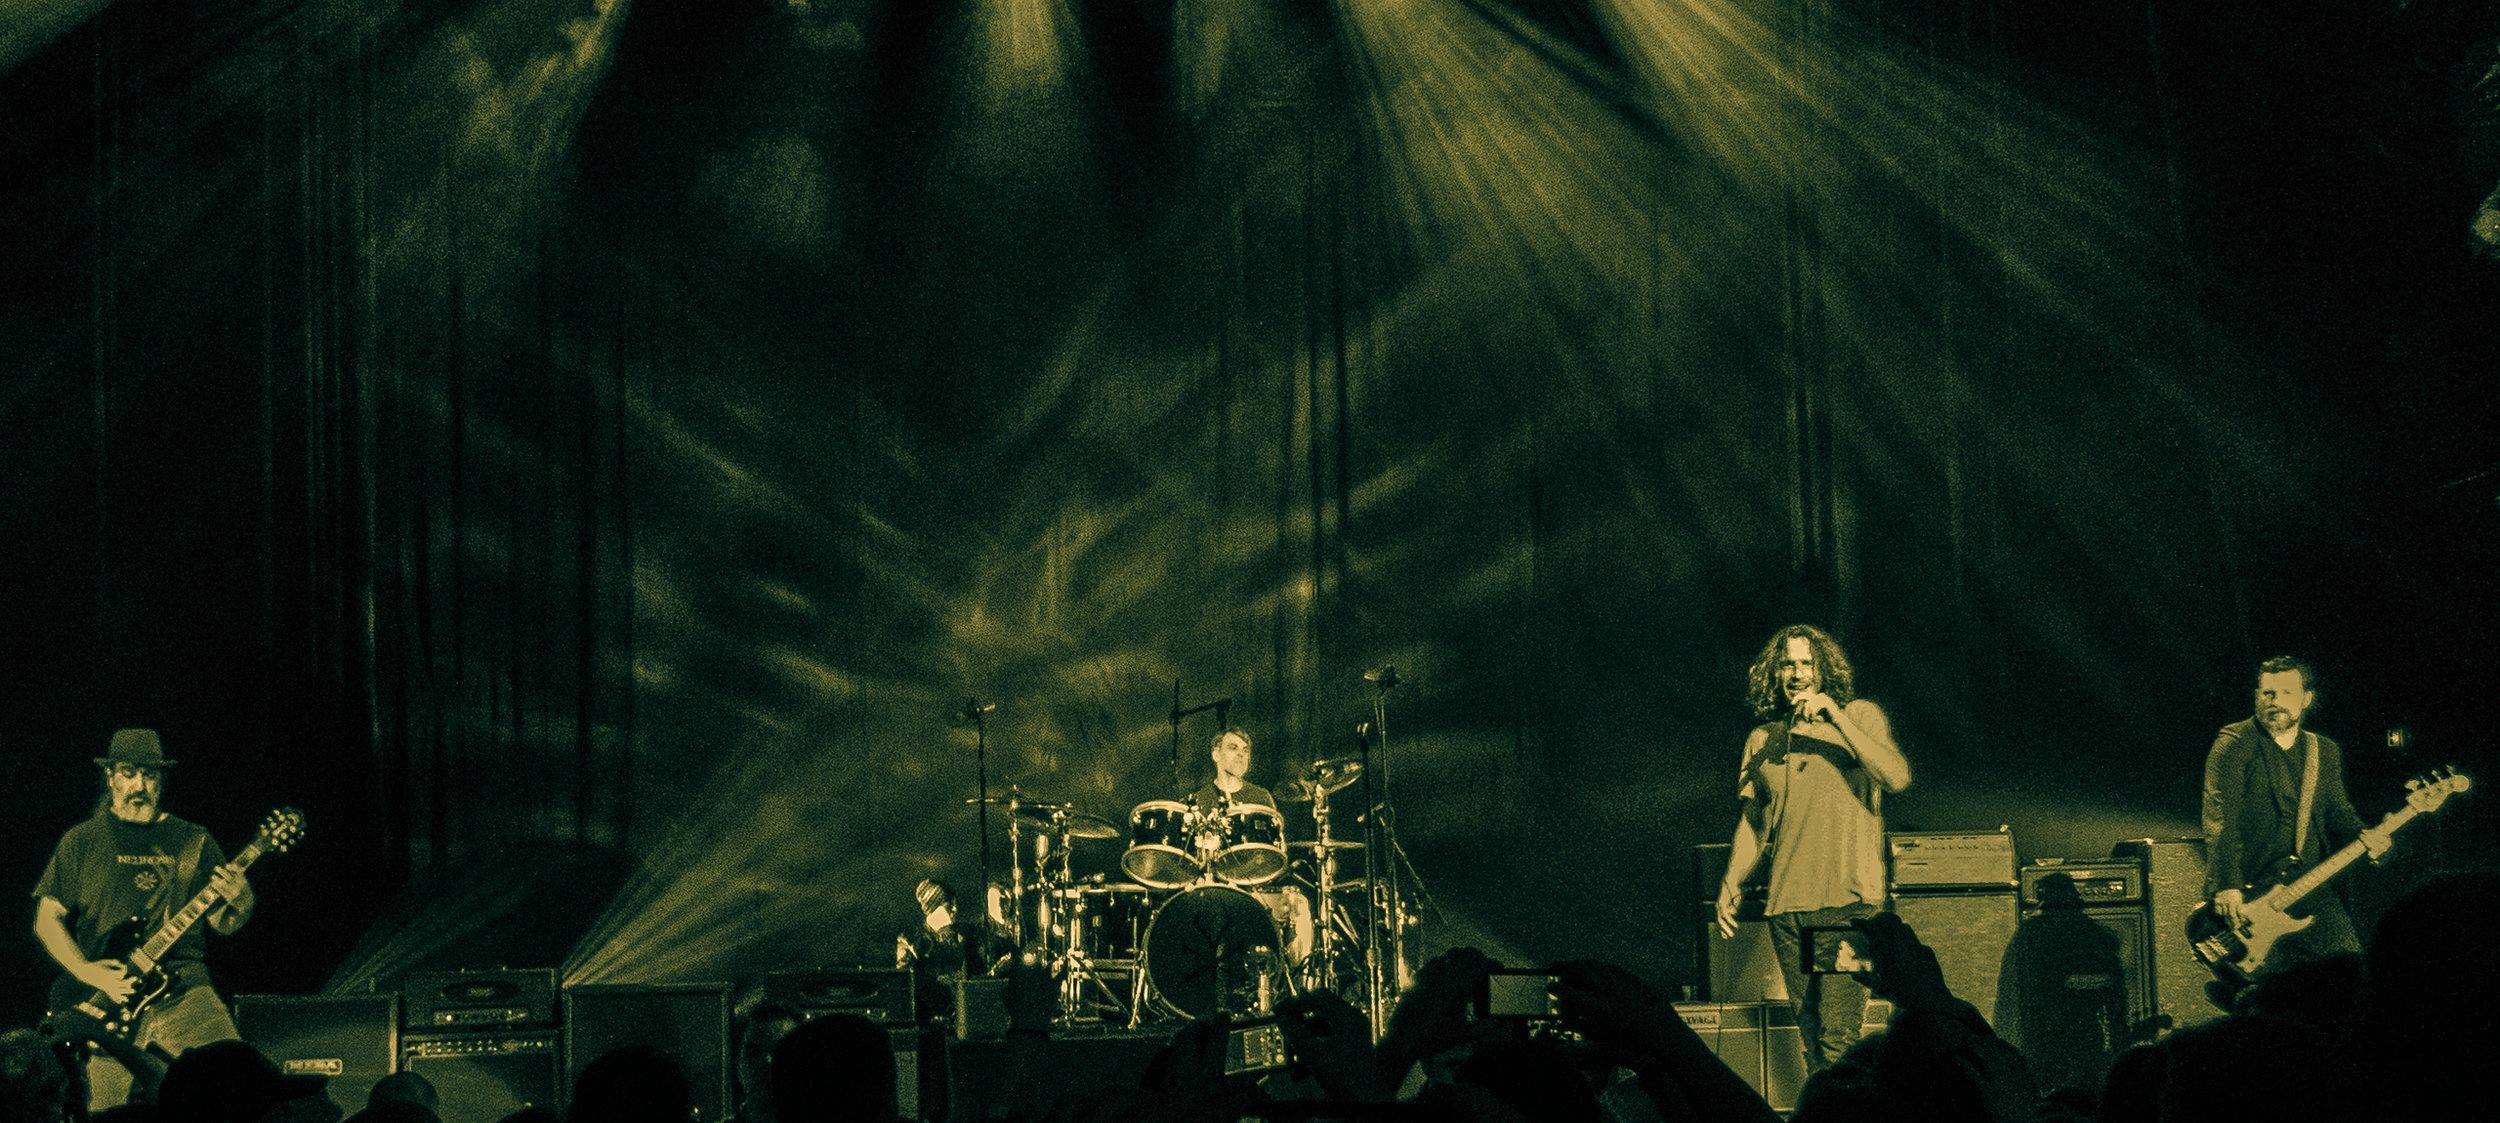 Soundgarden_at_Paramount_Theatre.jpg